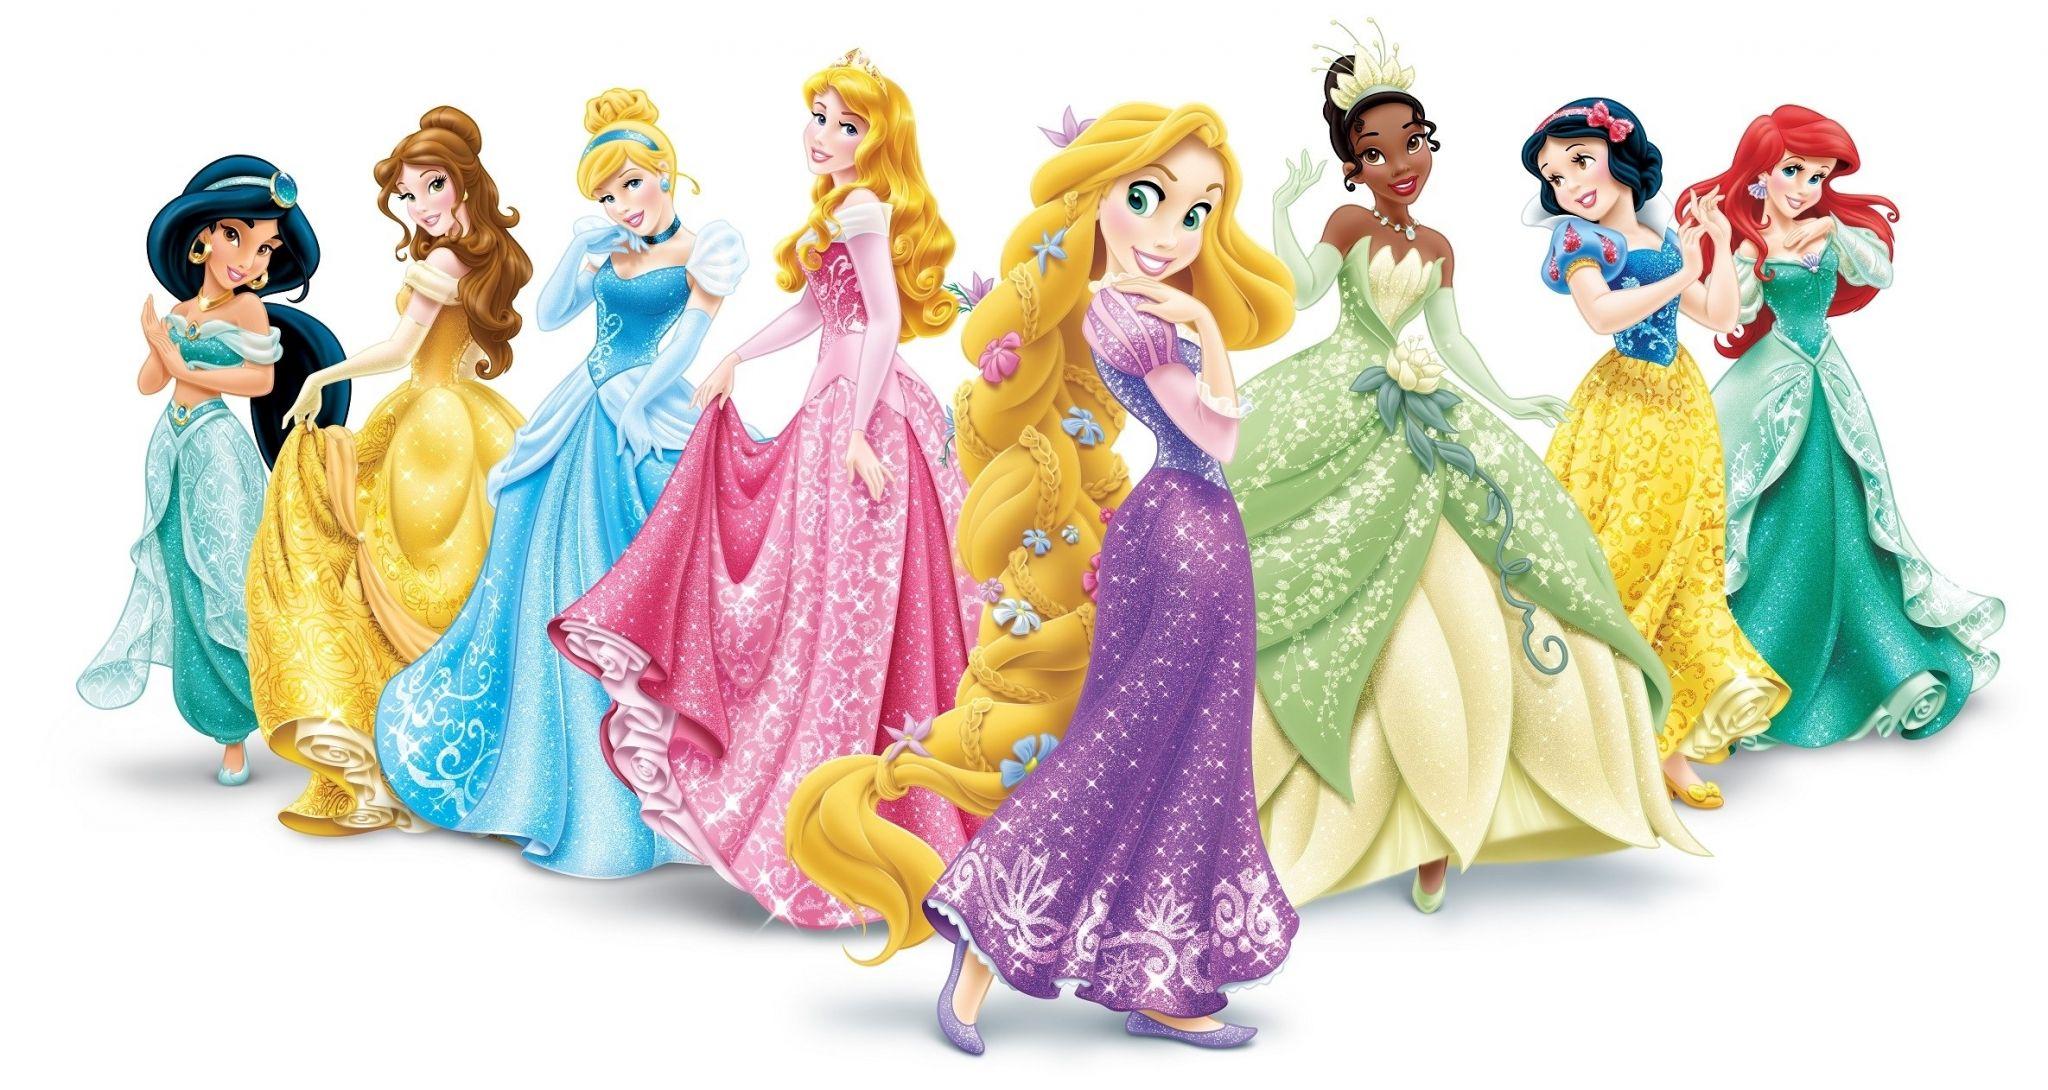 Disney Hd Widescreen Wallpapers Disney Princess Png Disney Princess Drawings Disney Princess Wallpaper